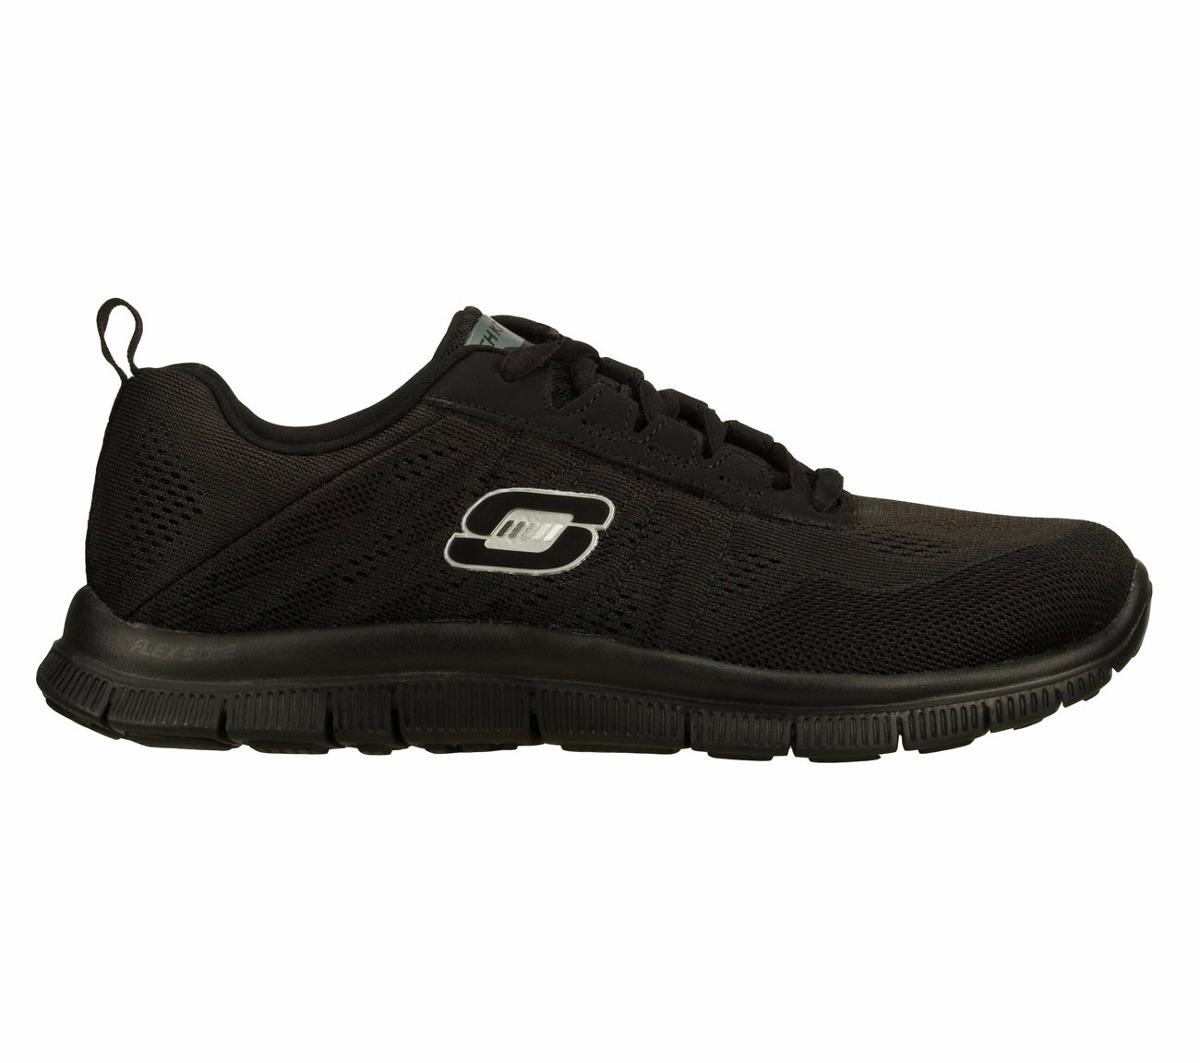 Zapatos Skechers Flex Appeal para mujer neRZm0